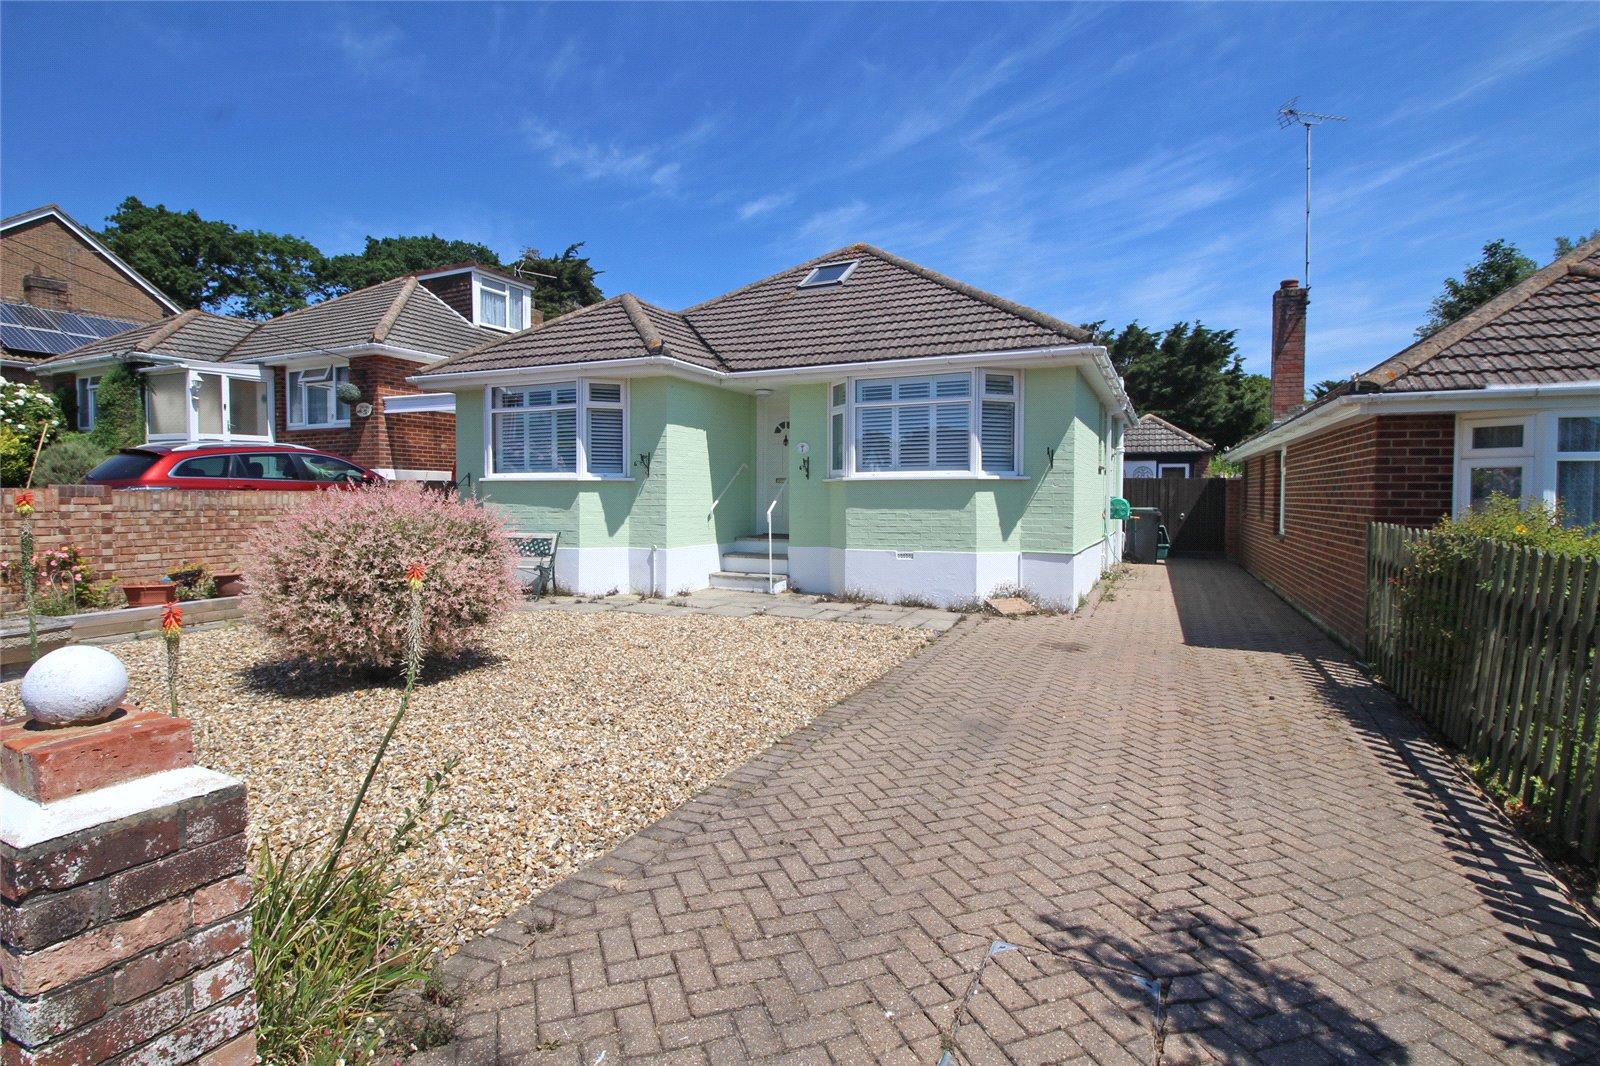 Holme Road, Highcliffe, Christchurch, Dorset, BH23